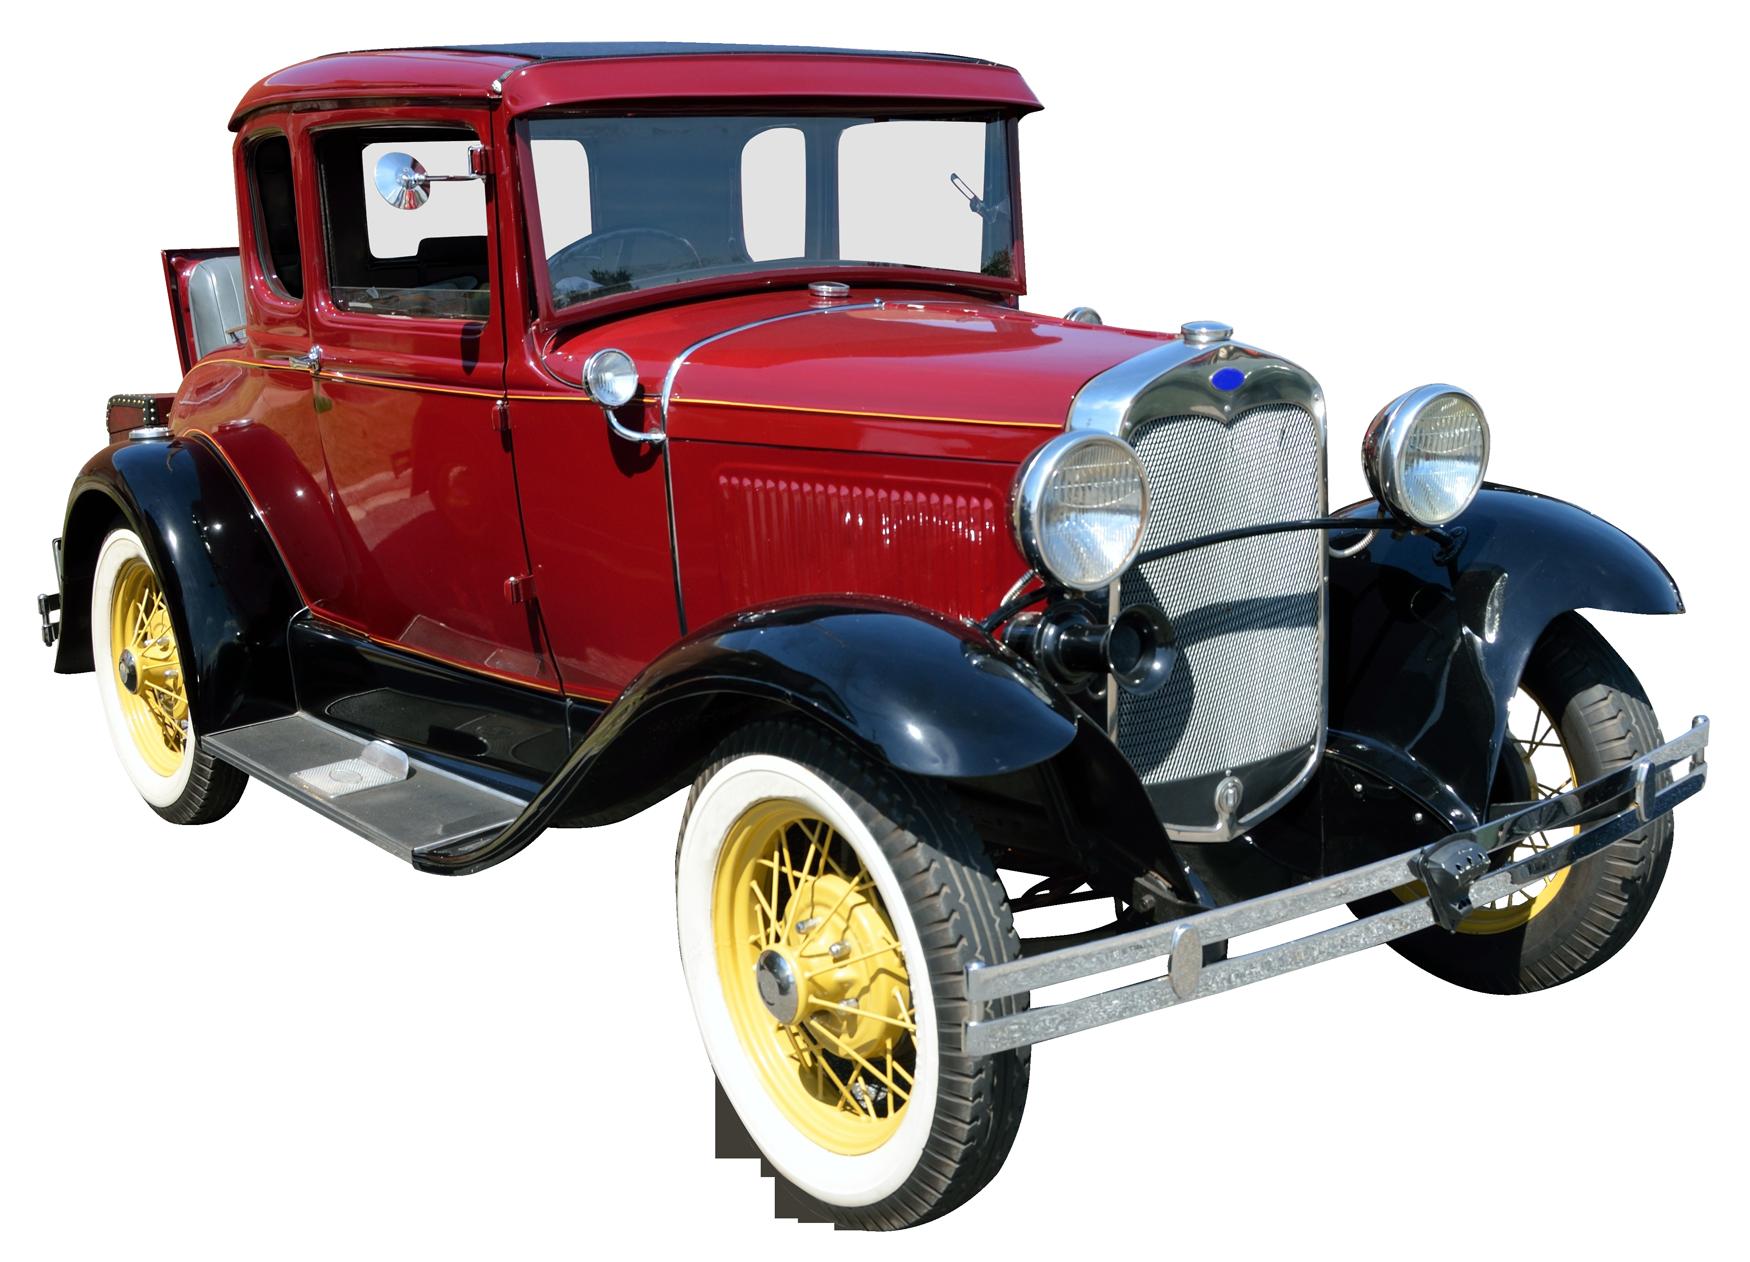 Vintage Car PNG Image - PurePNG | Free transparent CC0 PNG Image Library